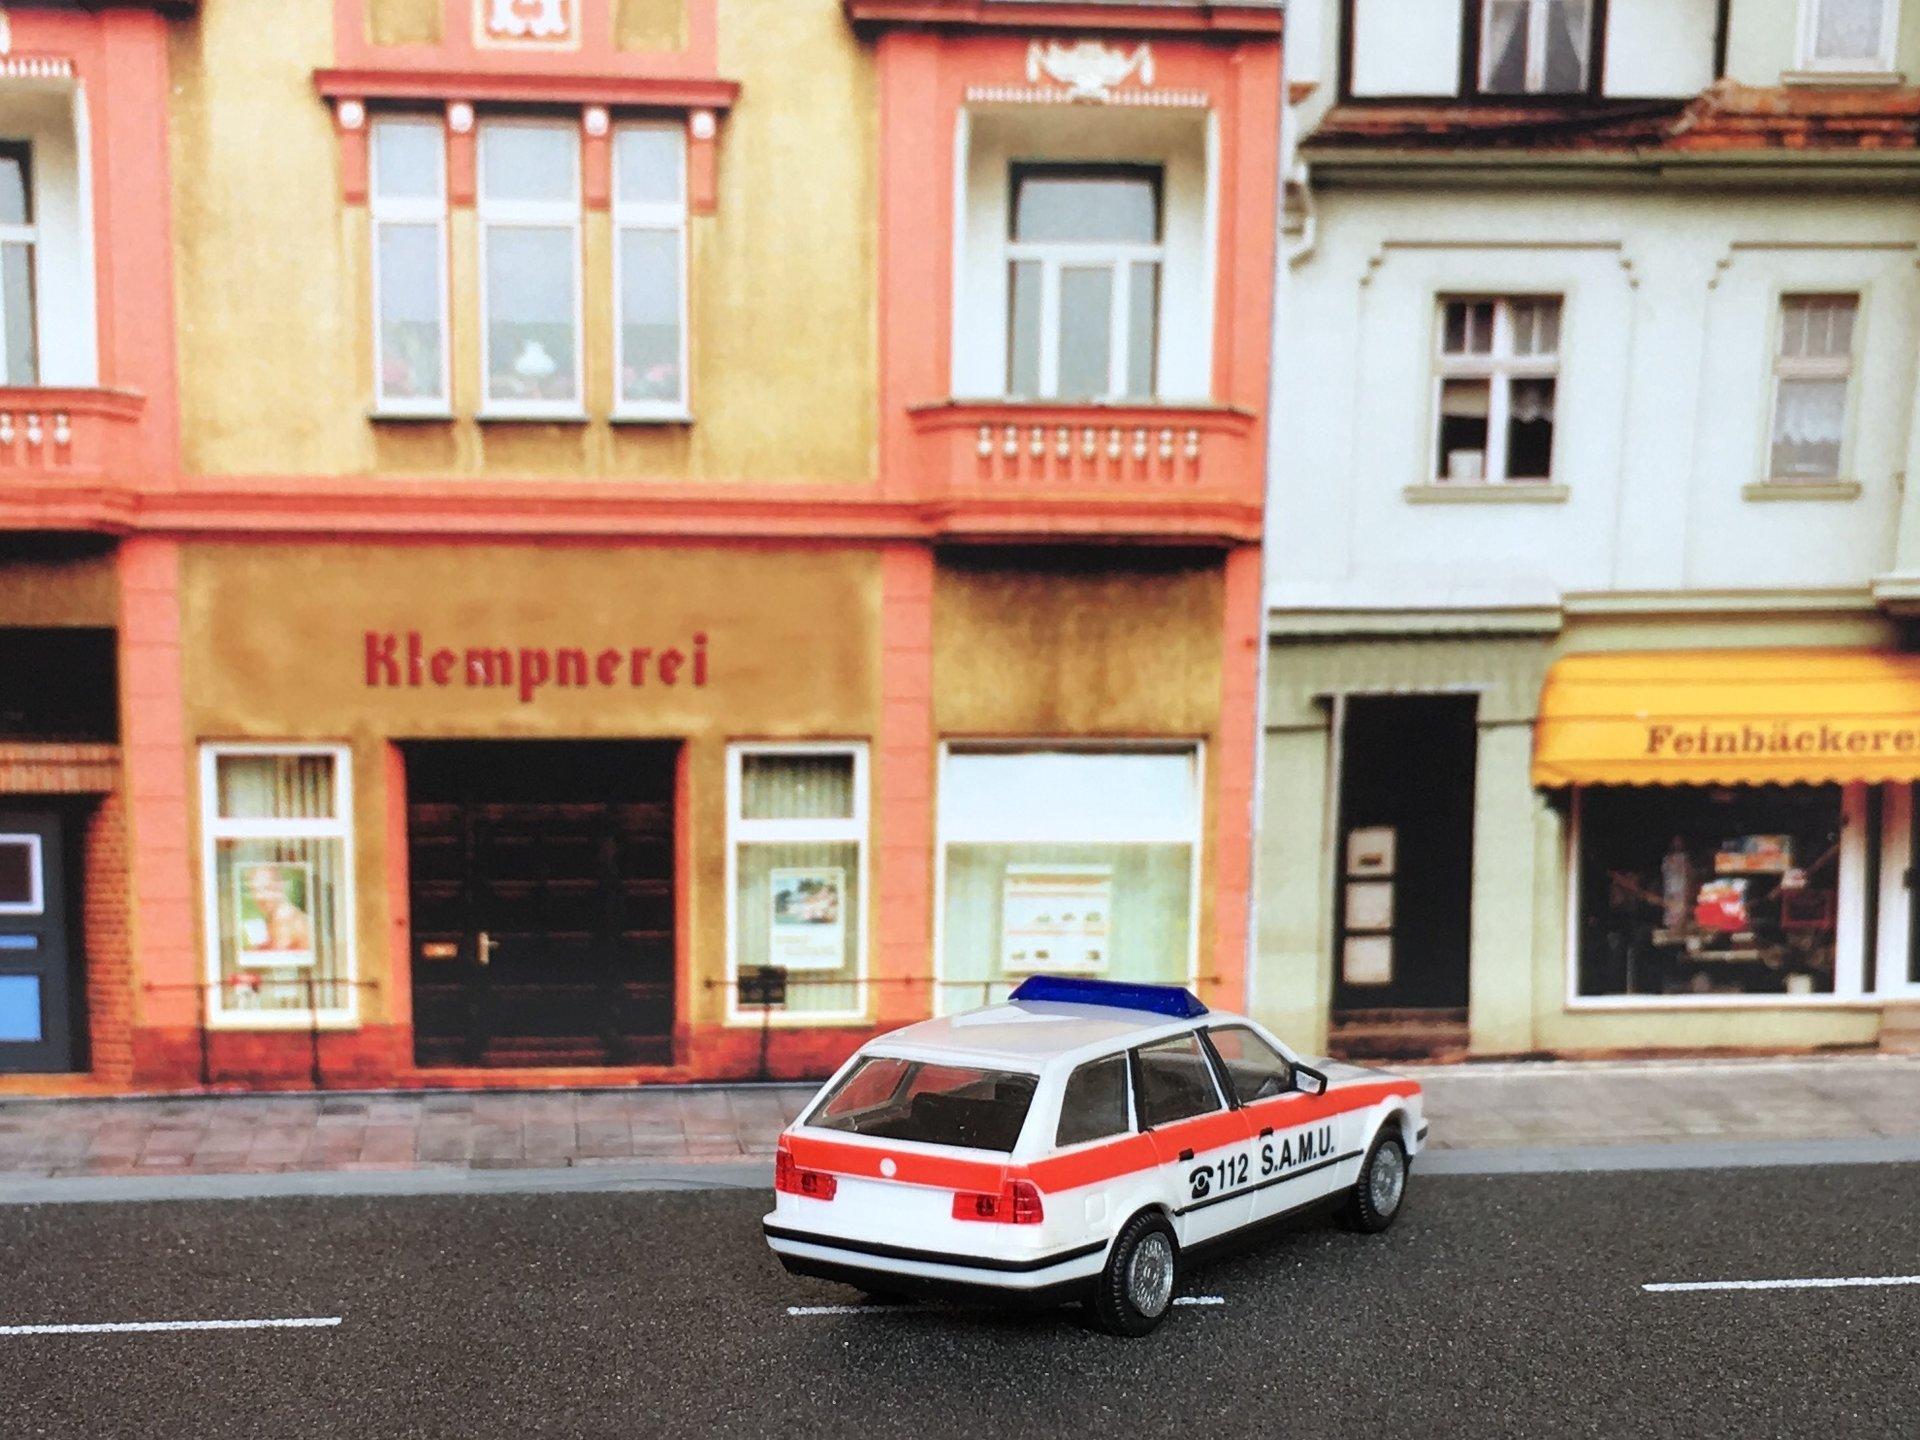 BMW 525i SAMU 03.jpg